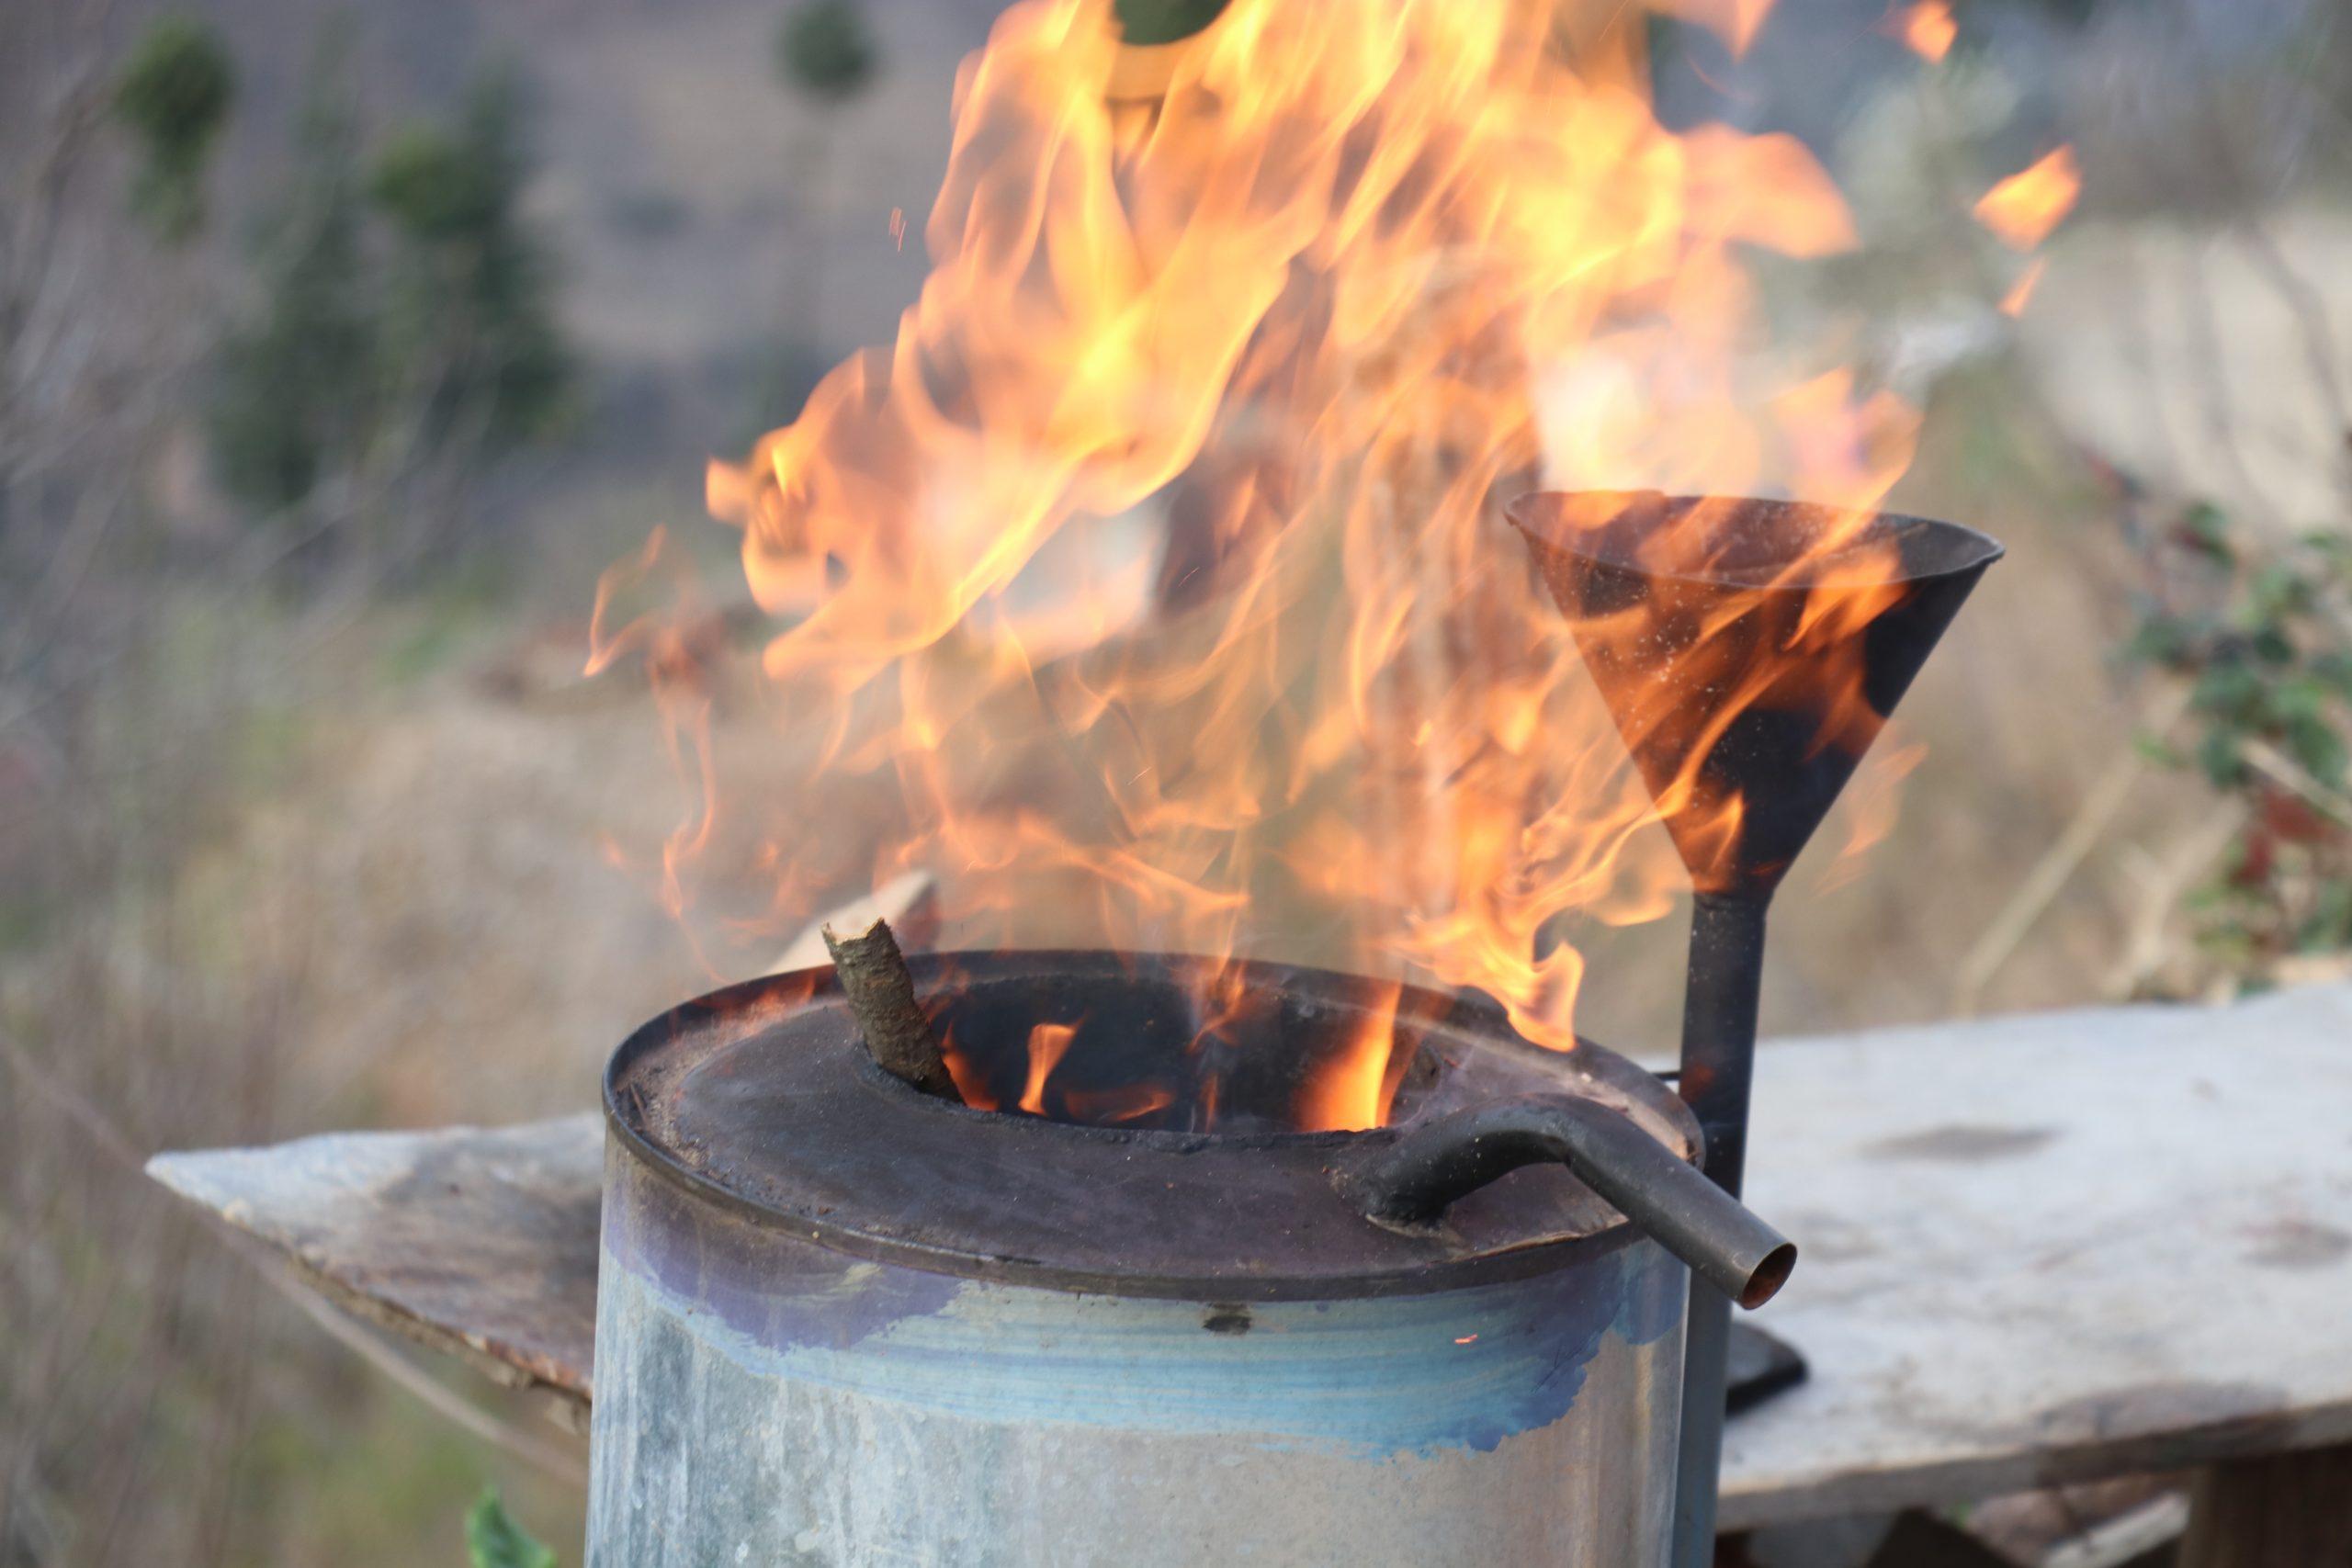 Outdoor coal stove